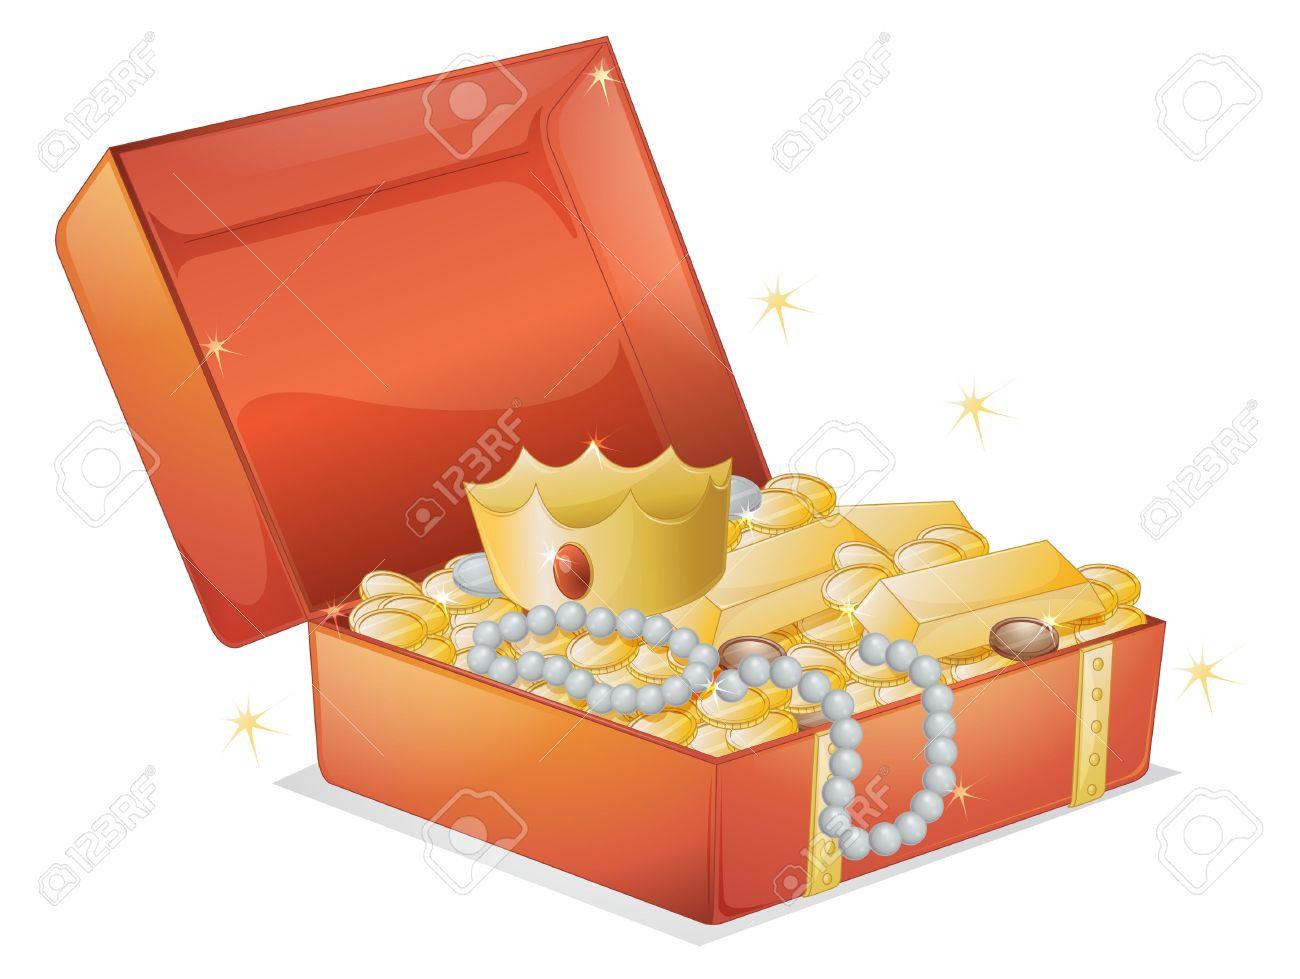 Jewel box clipart - Clipground